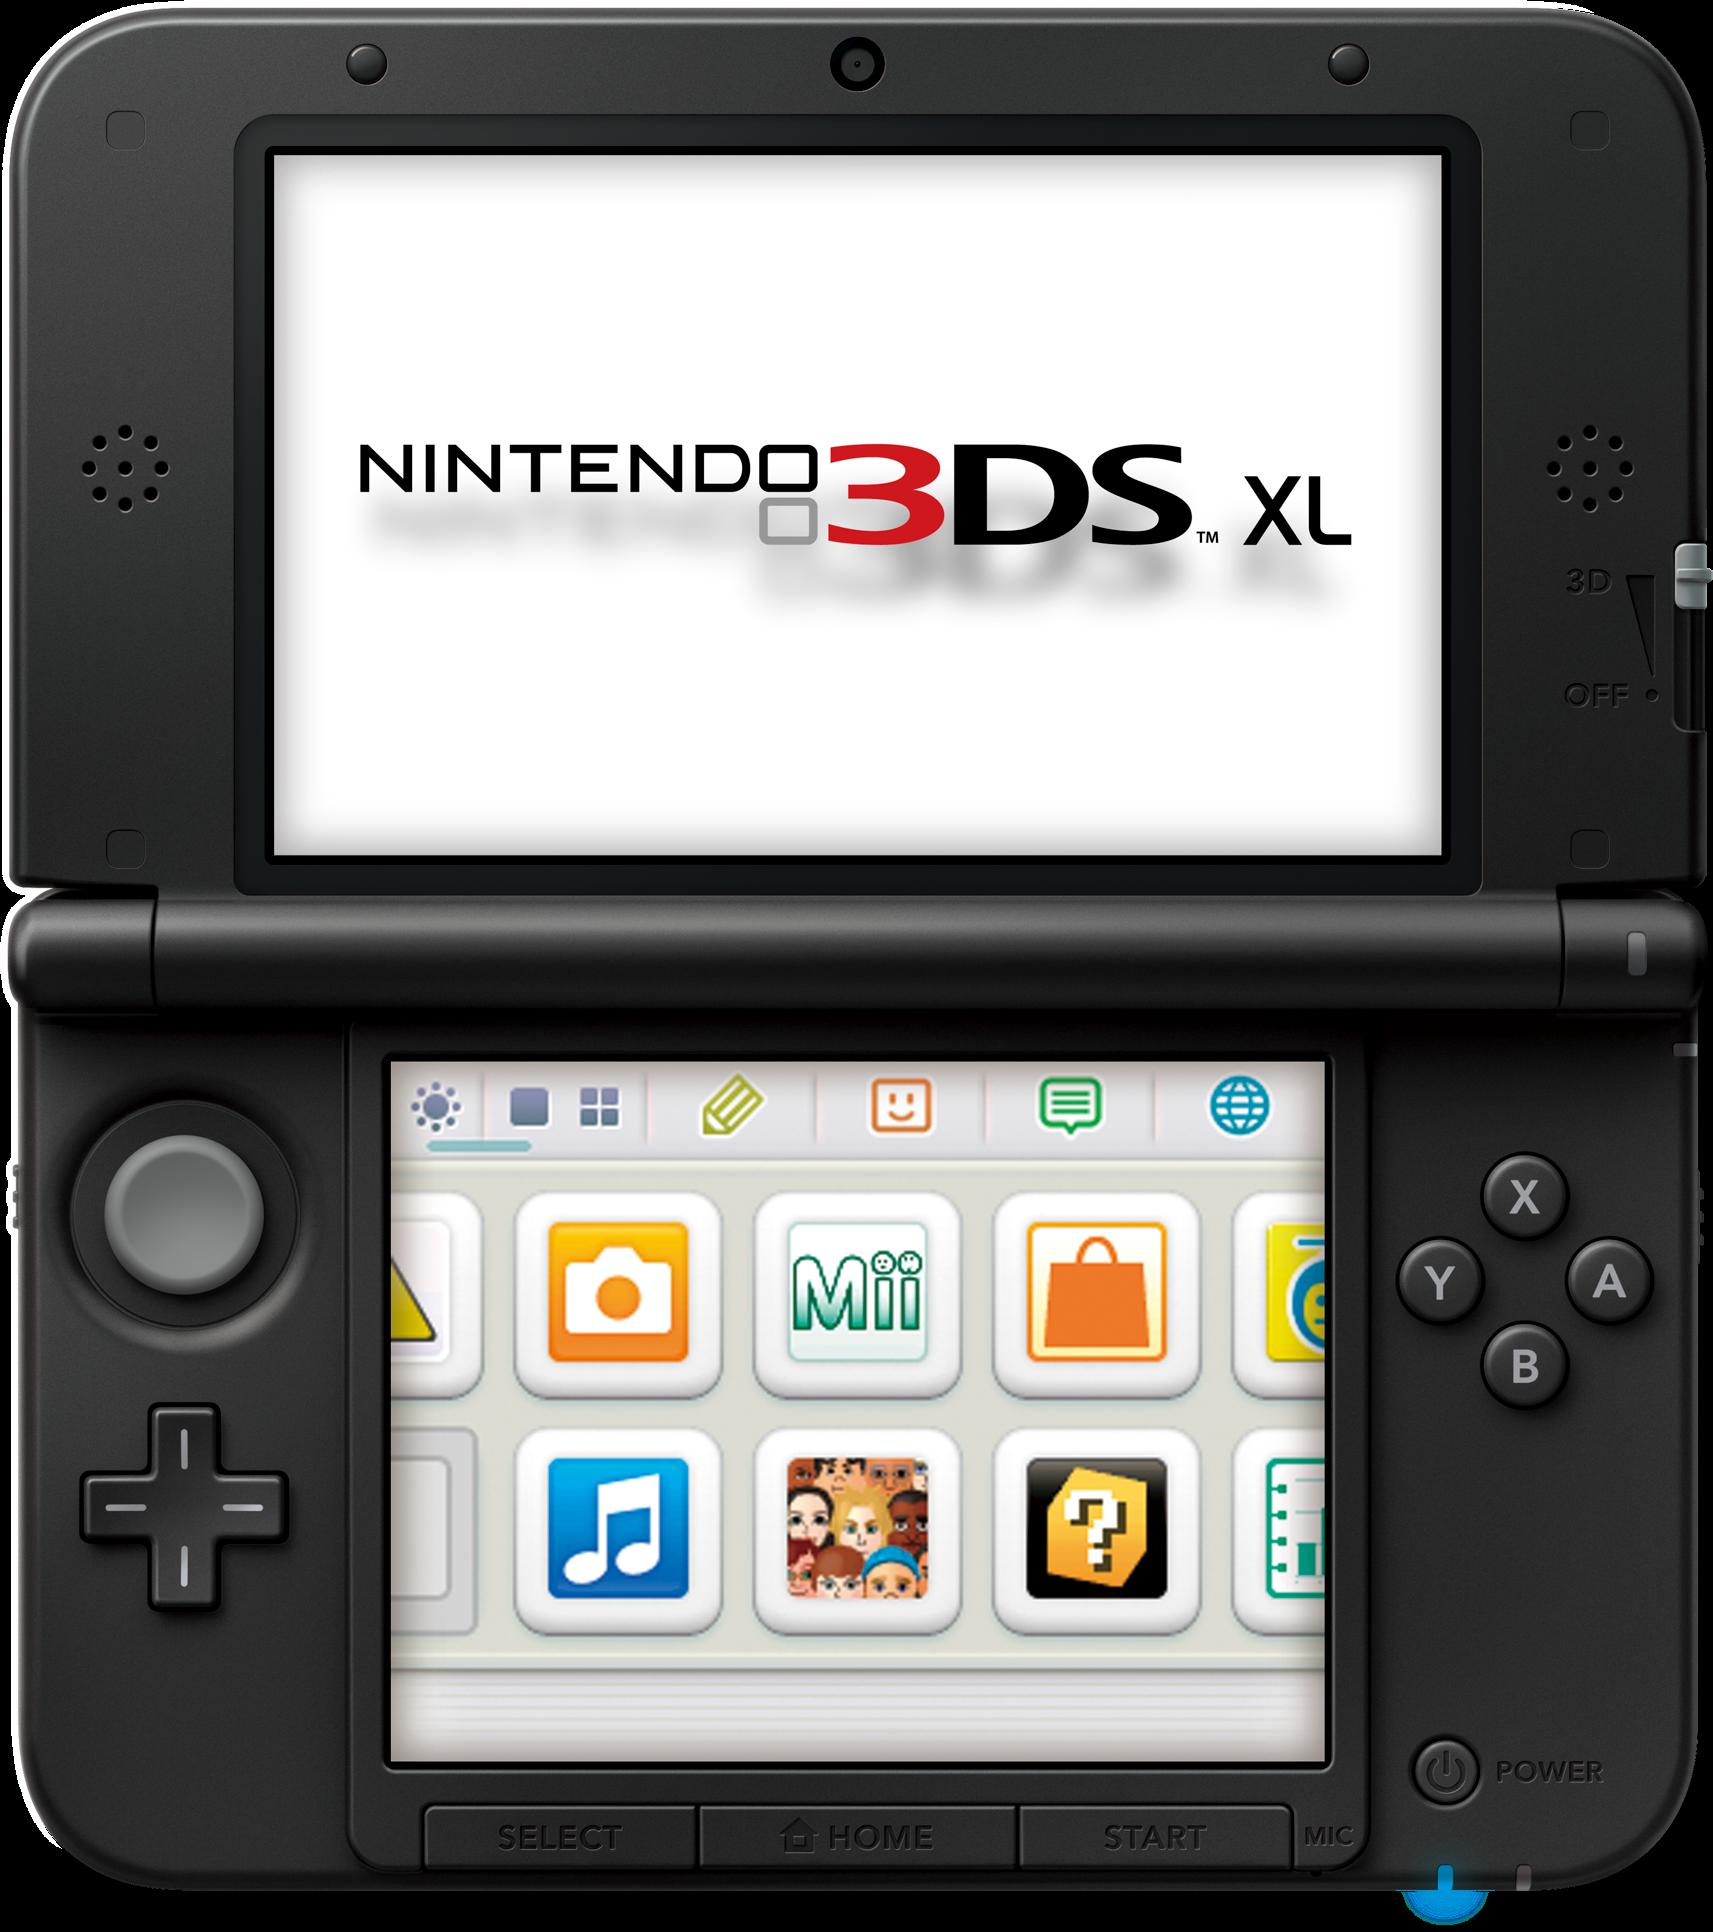 Nintendo 3ds Threediots Territory Fandom Powered By Wikia Ds Lite Edge The Xl